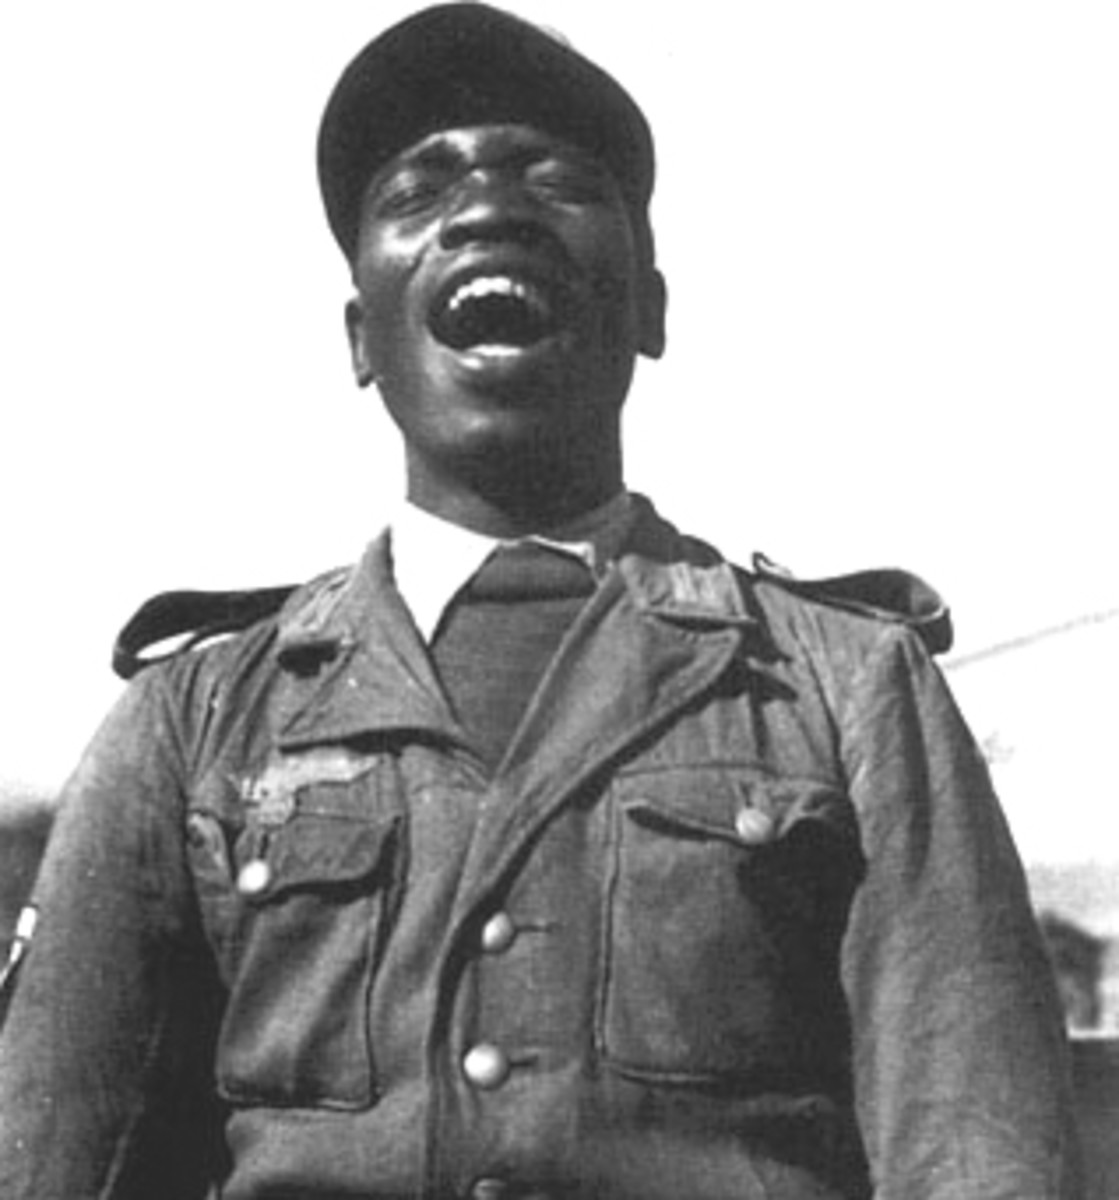 Another African-Muslim volunteer in the German Army